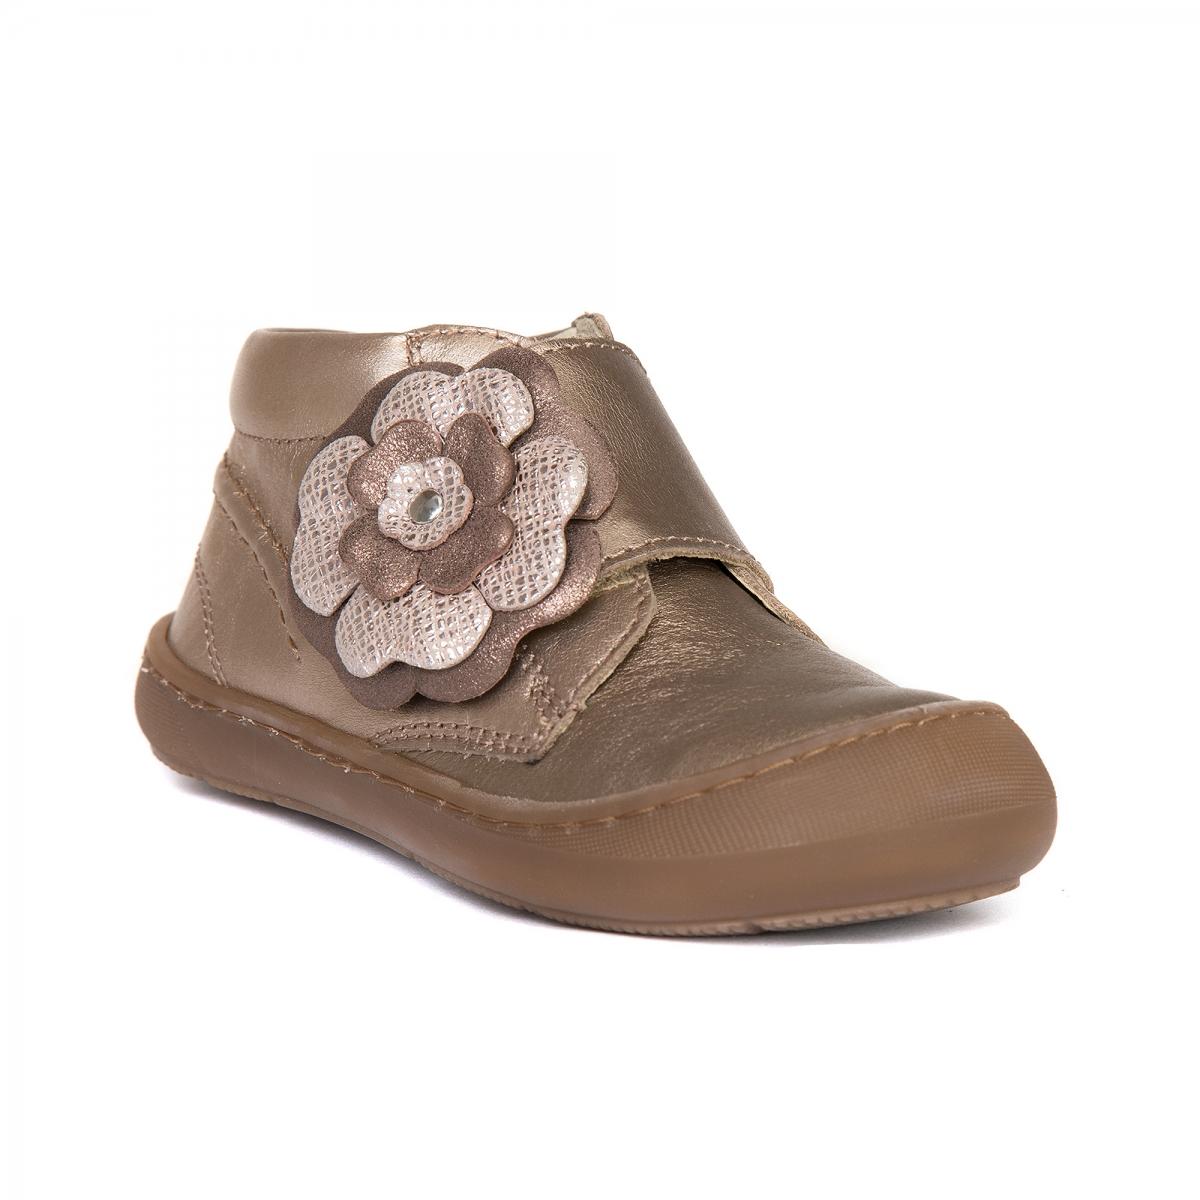 Ghetute fete flexibile din piele pj shoes Edy roz print 18-25